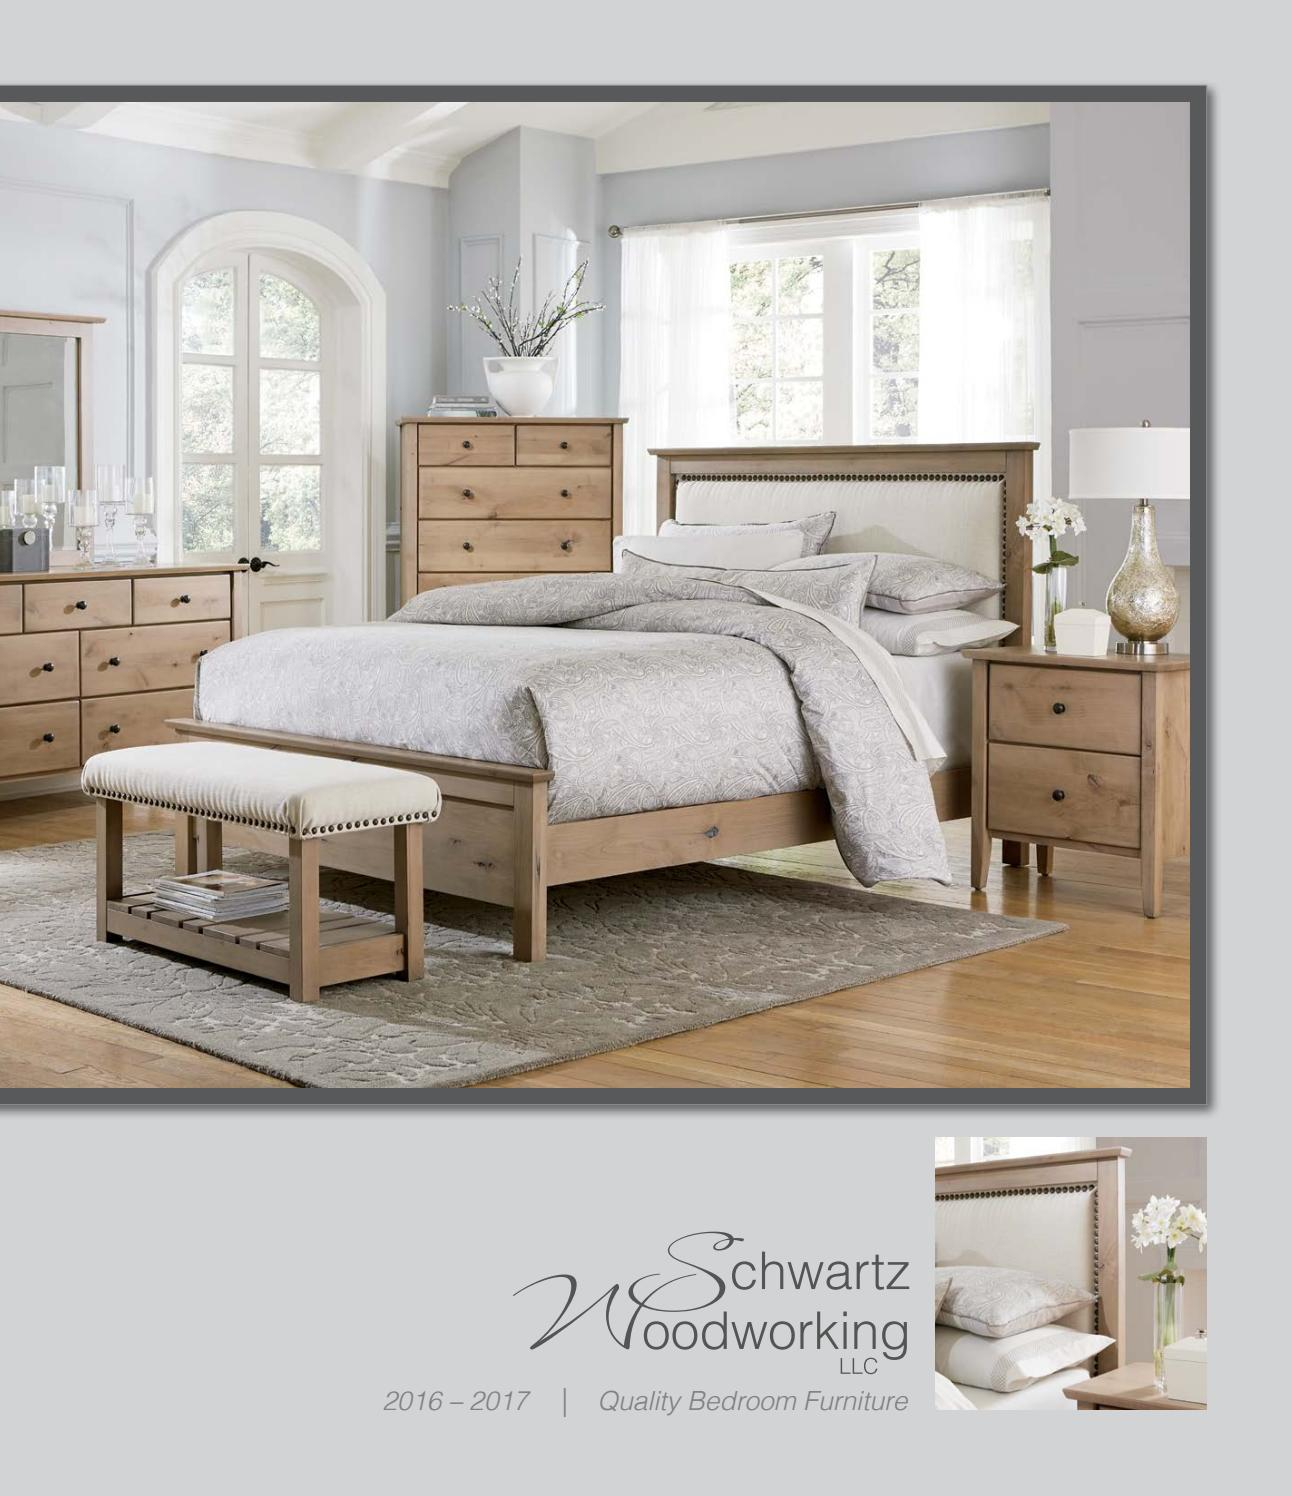 2016 Schwartz Woodworking Catalog / Bedrooms / E & G Amish Furntire ...